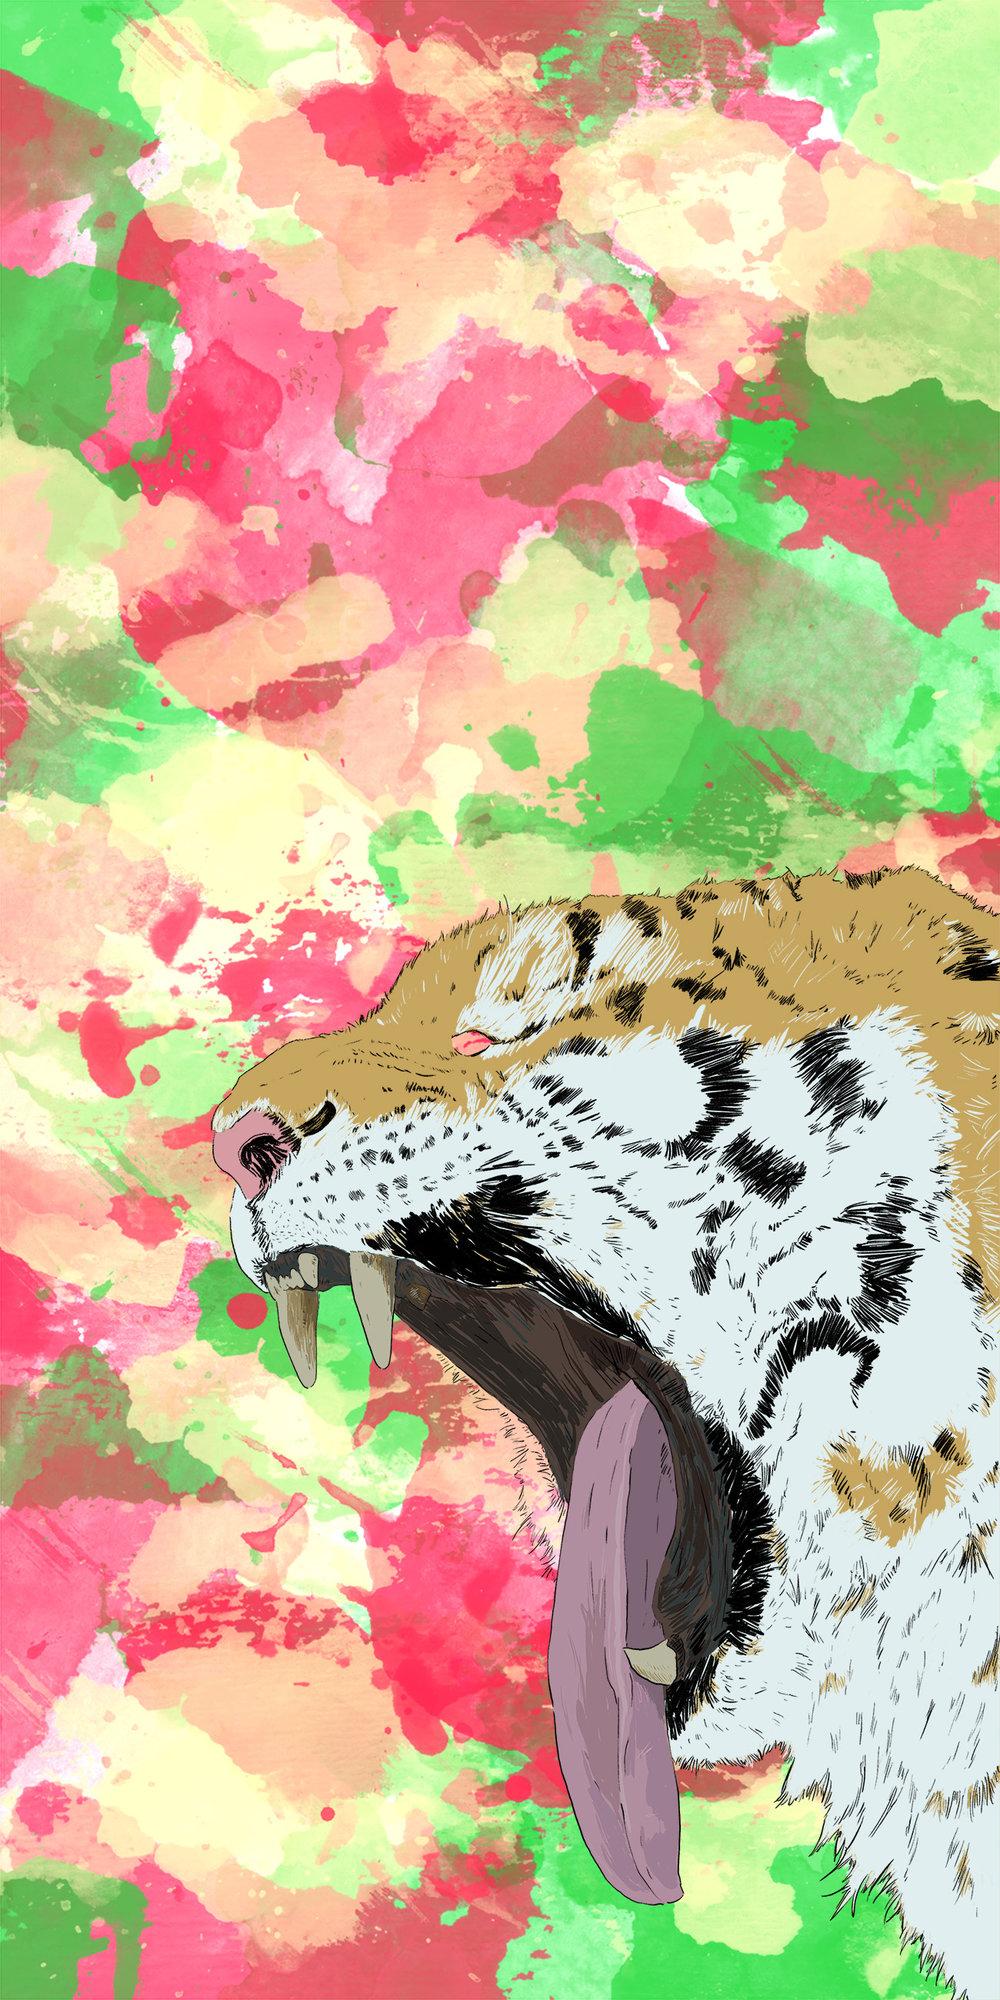 Flamm_Tiger Blood_Tiger Splat.jpg